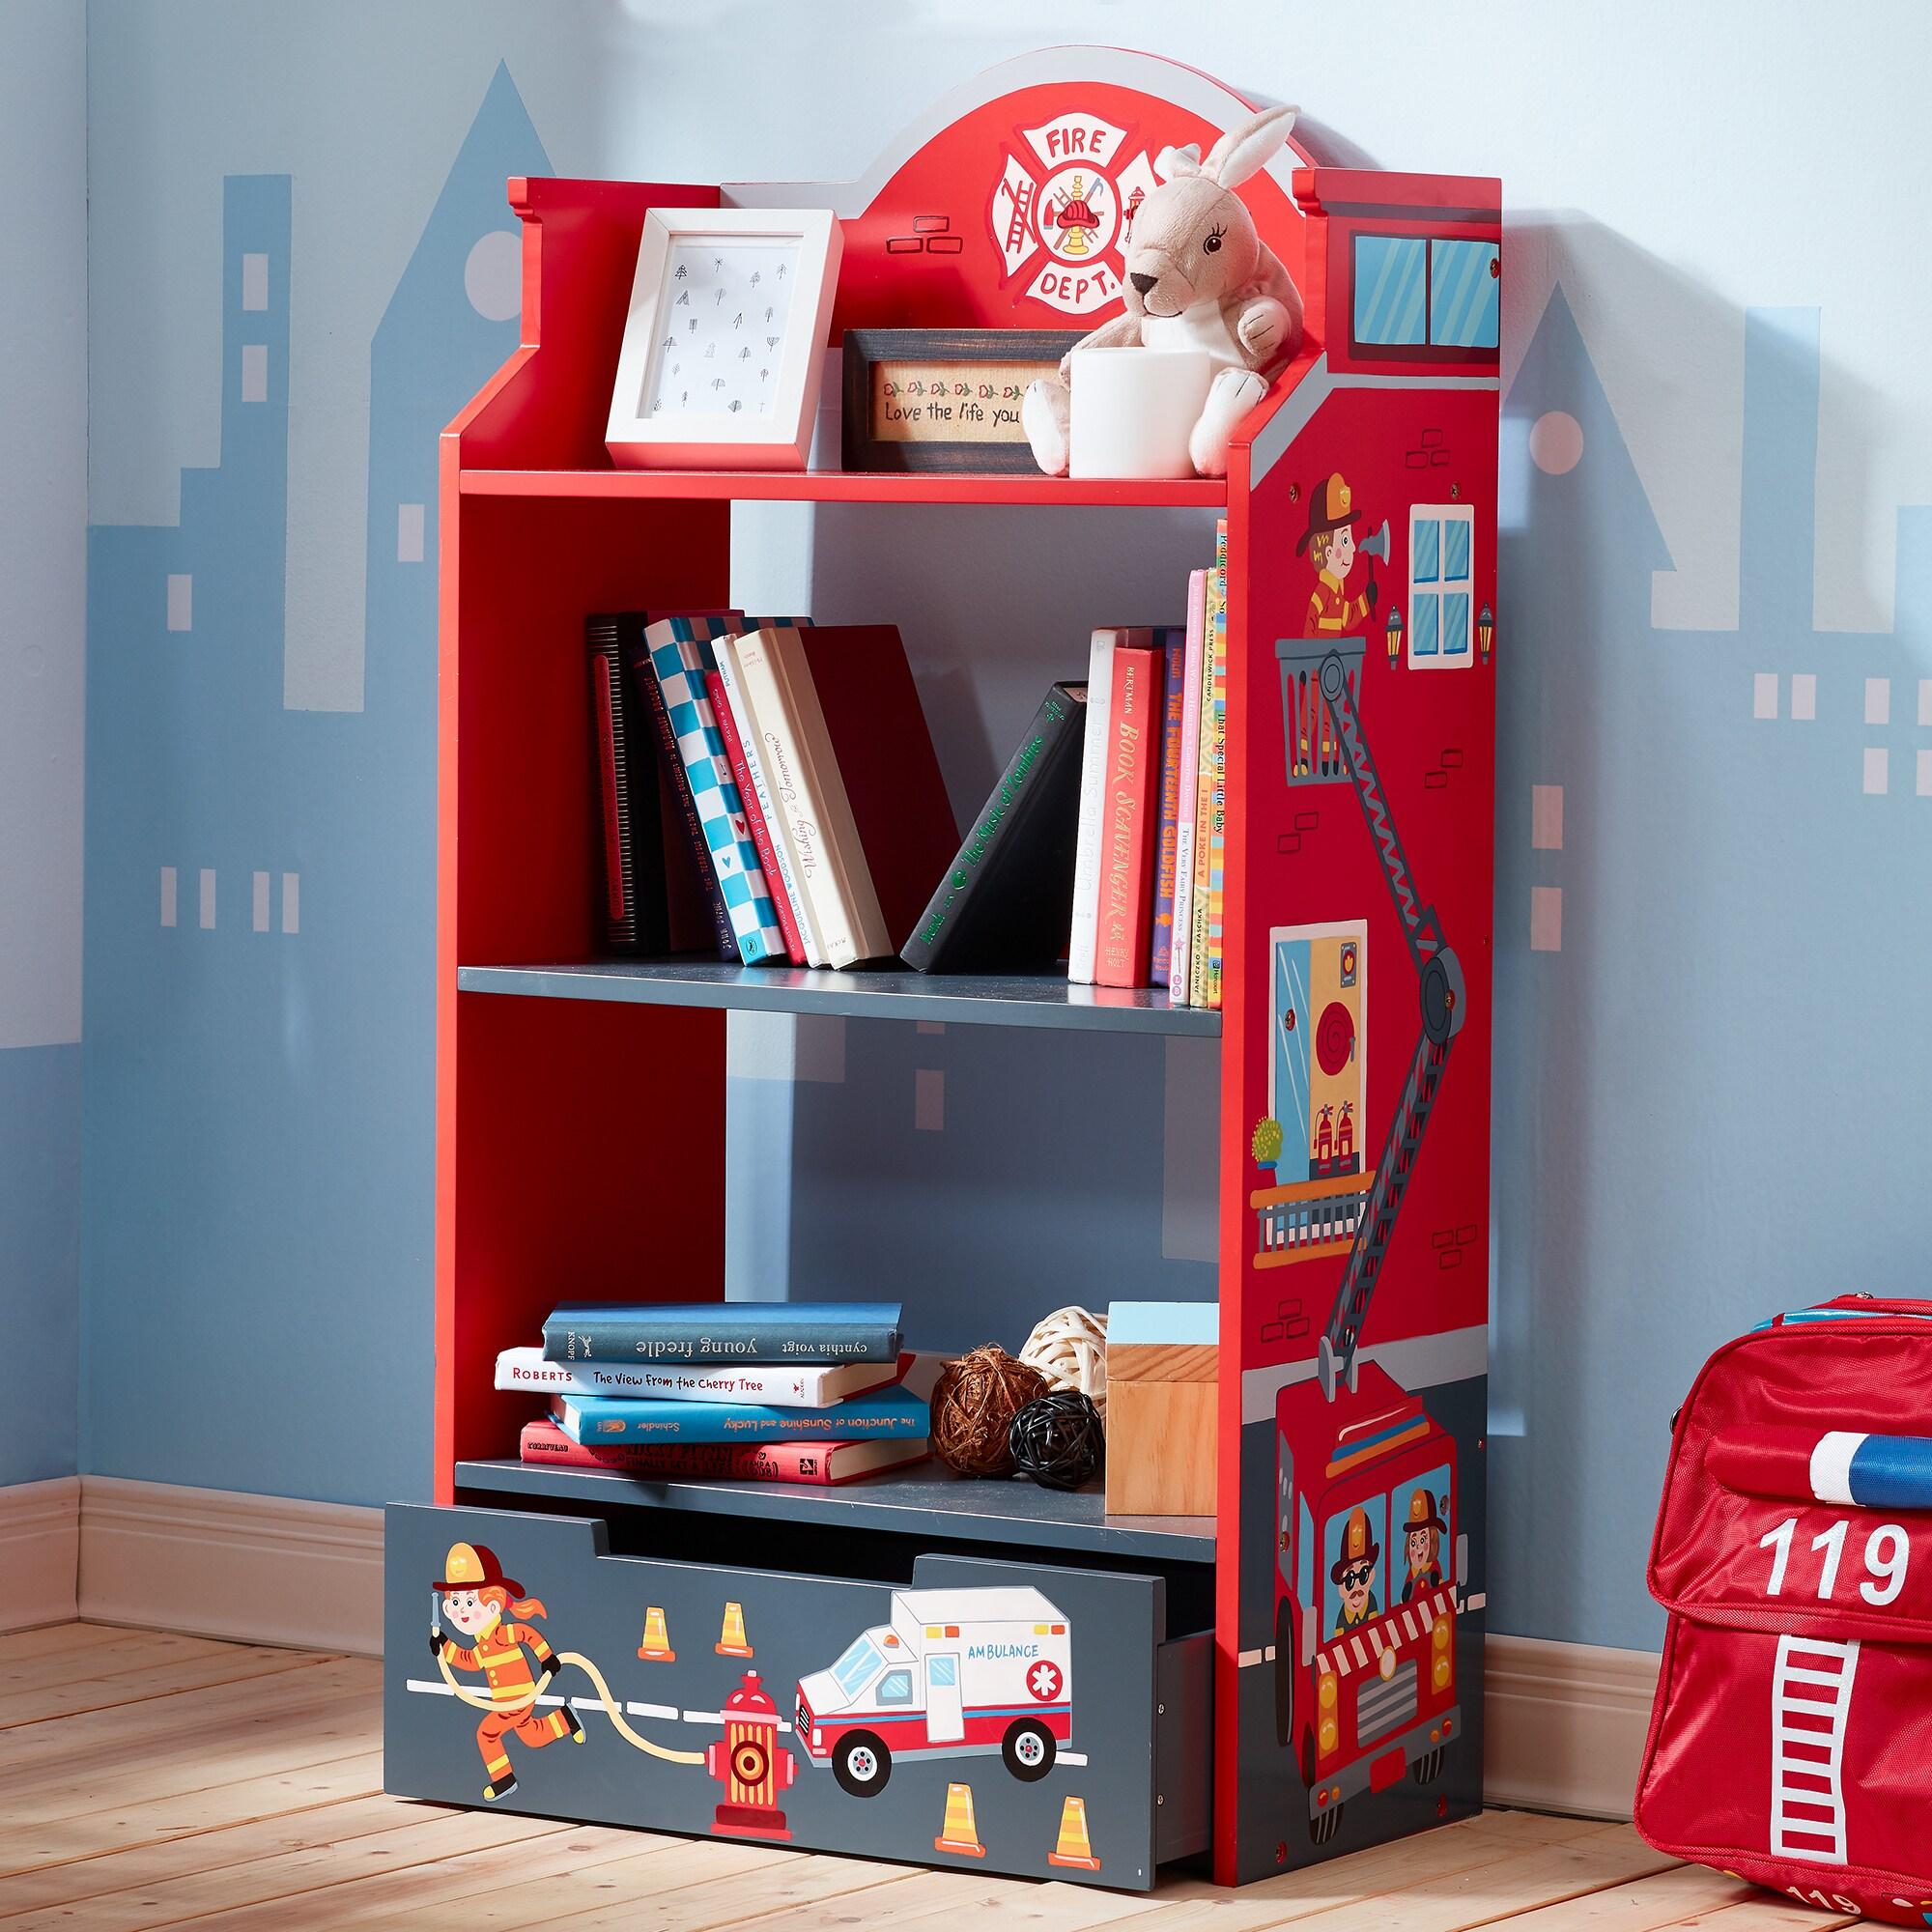 office world category wall decor pillows wood decorative bookshelf xxx market organization letter do crate home storage